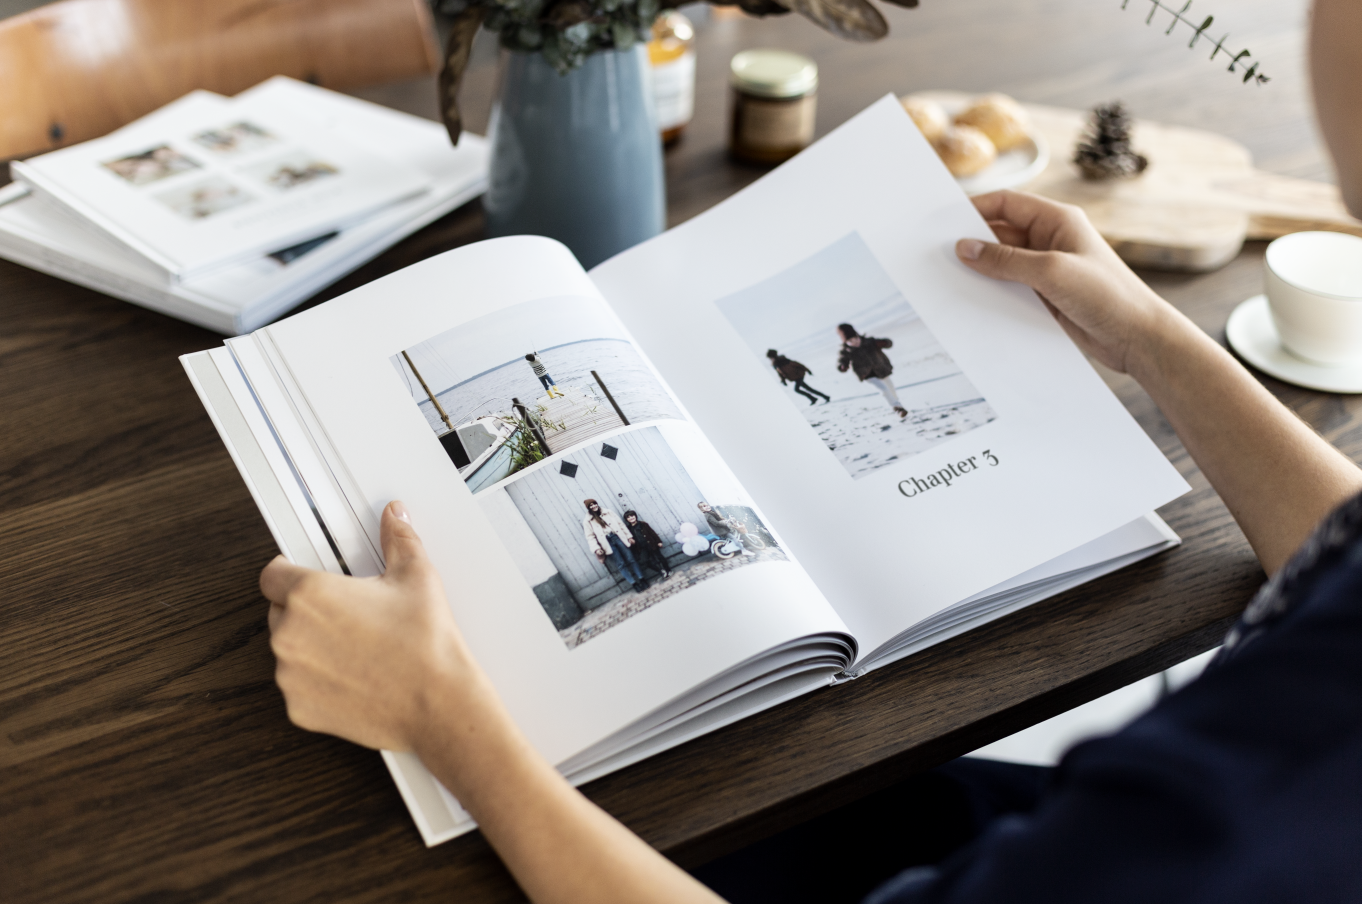 coffee-table photo books